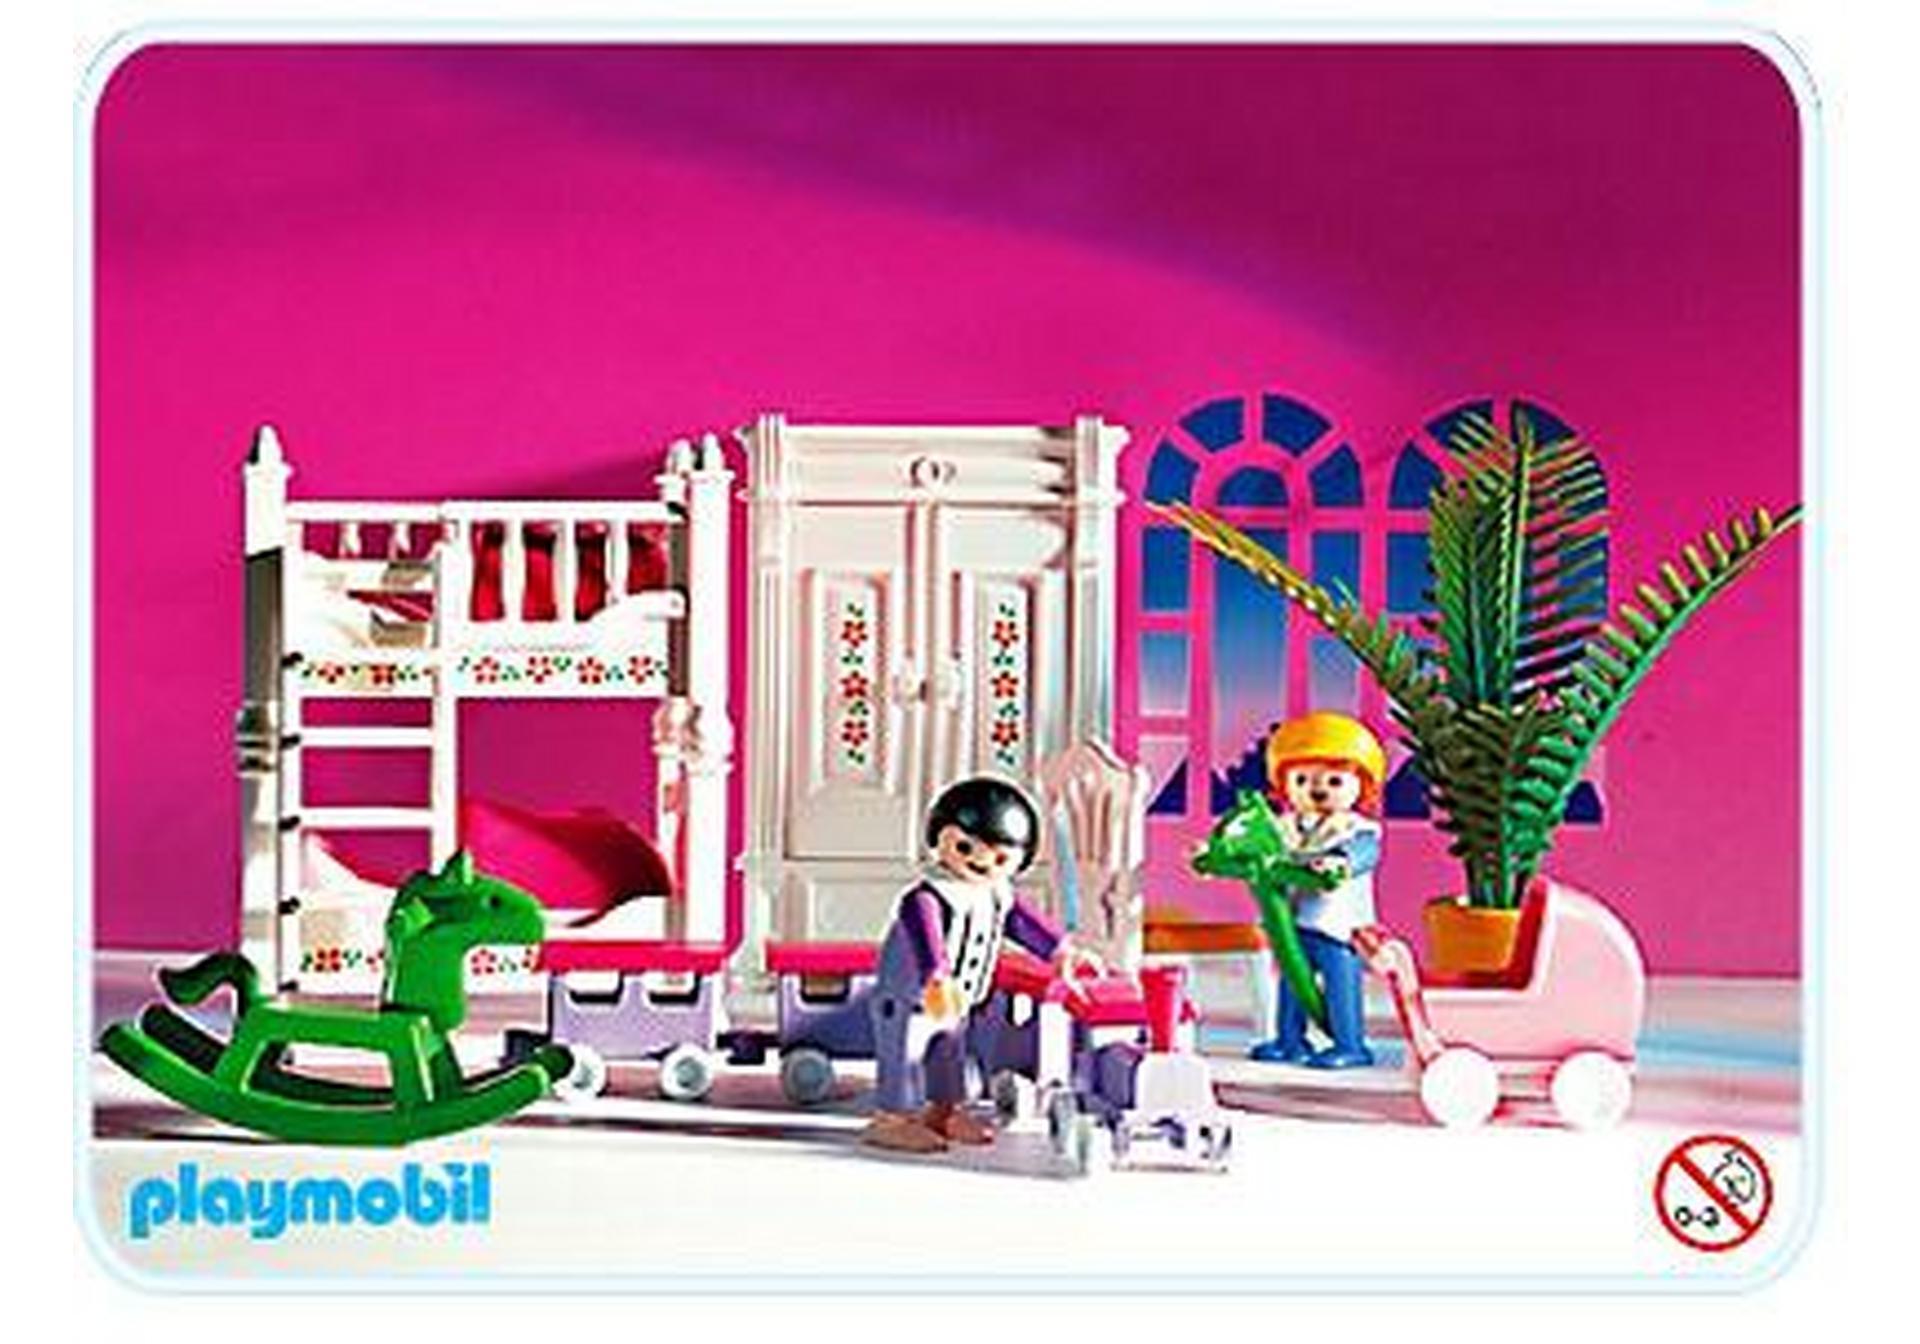 Kinderzimmer 5312 a playmobil deutschland for Kinderzimmer playmobil